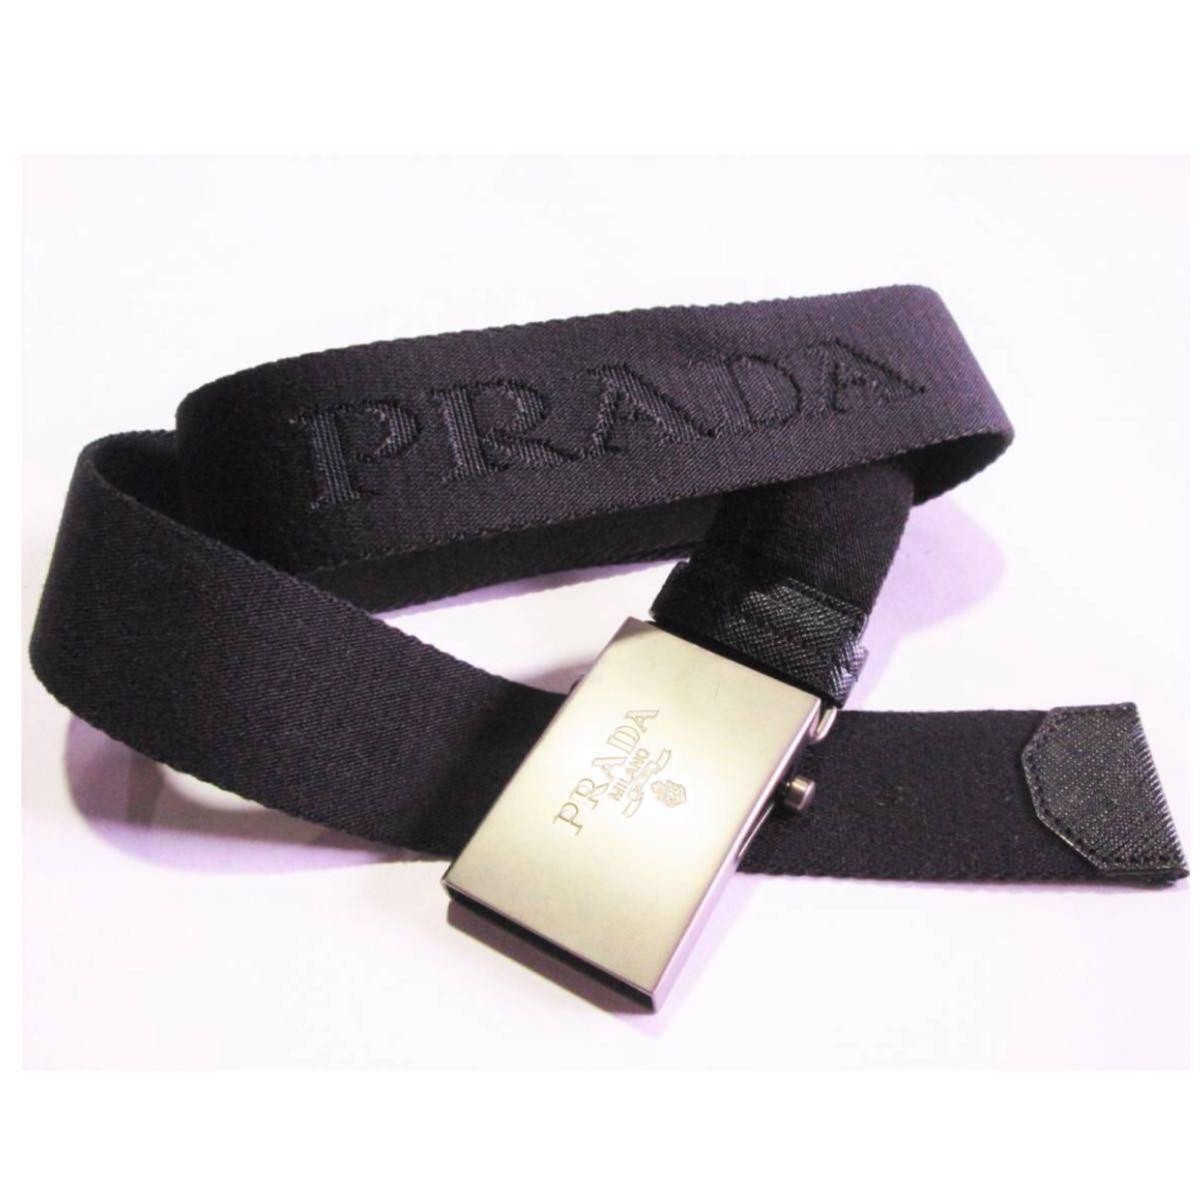 f2ff5468cc35 プラダ PRADA MILANO シンプル ロゴ ベルト ガチャベルト 黒 ブラック *同梱OK 0619